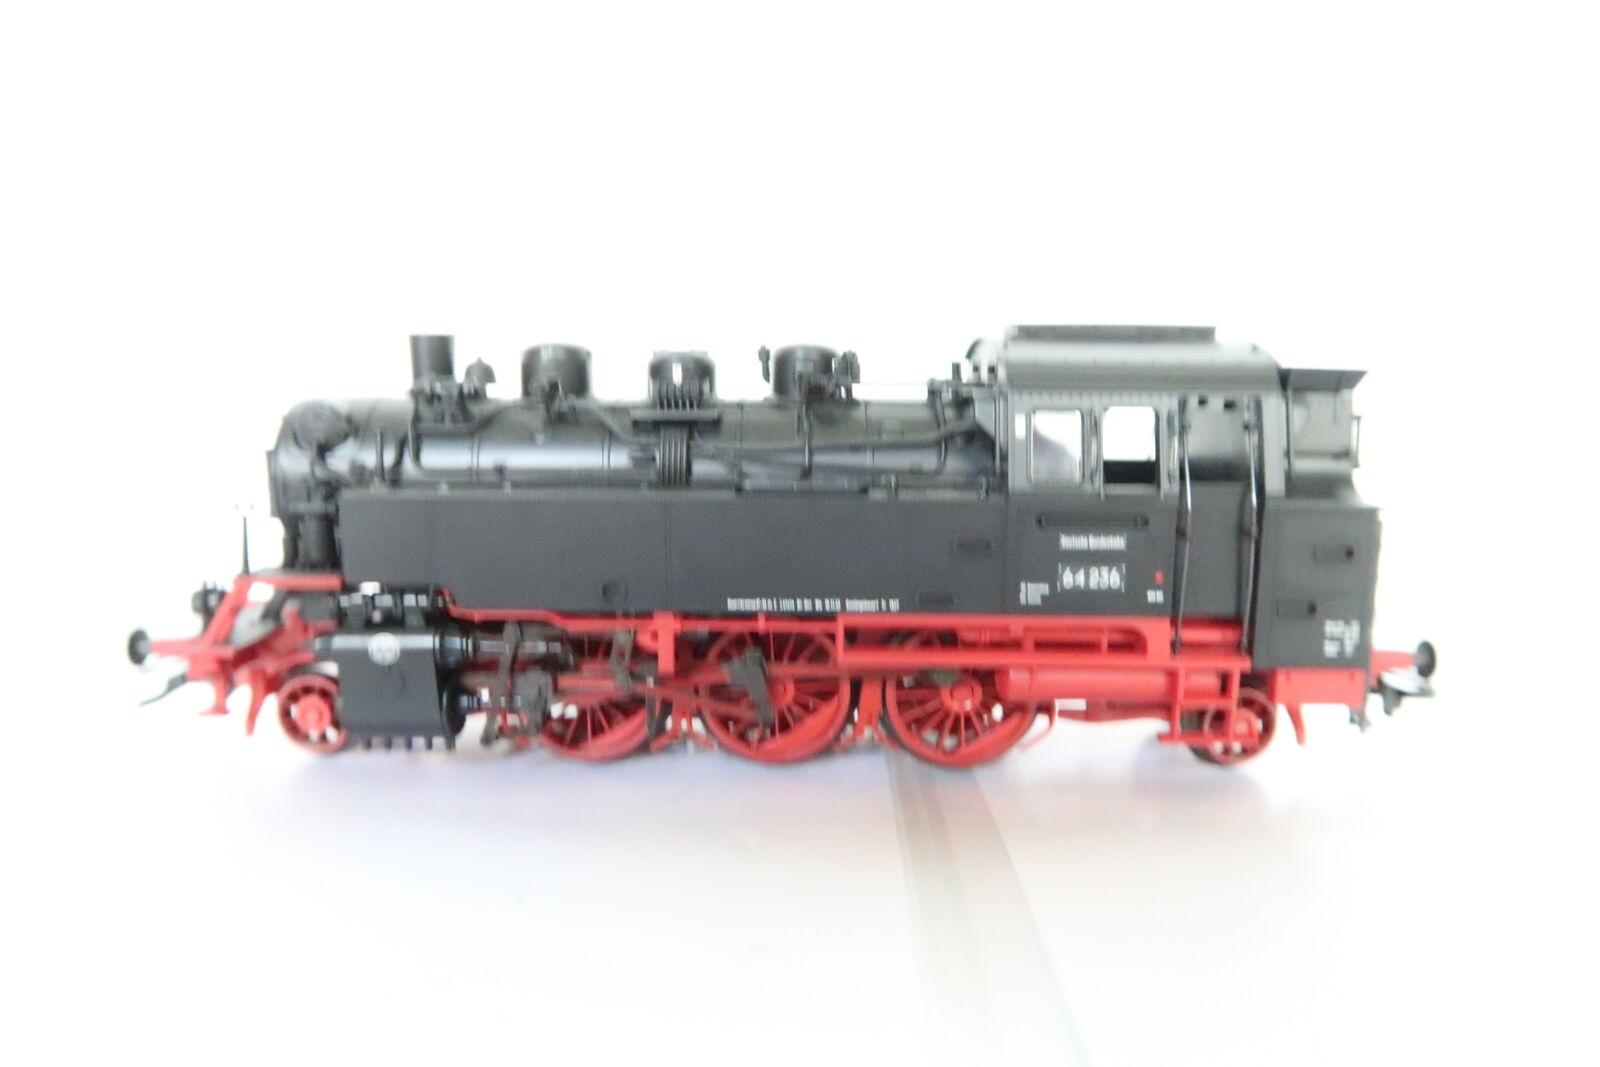 Digital   HO/AC 39644 a Vapore Locomotiva Locomotiva Locomotiva Br 64236 dB Sound  da/34-149s9/2  9459d7